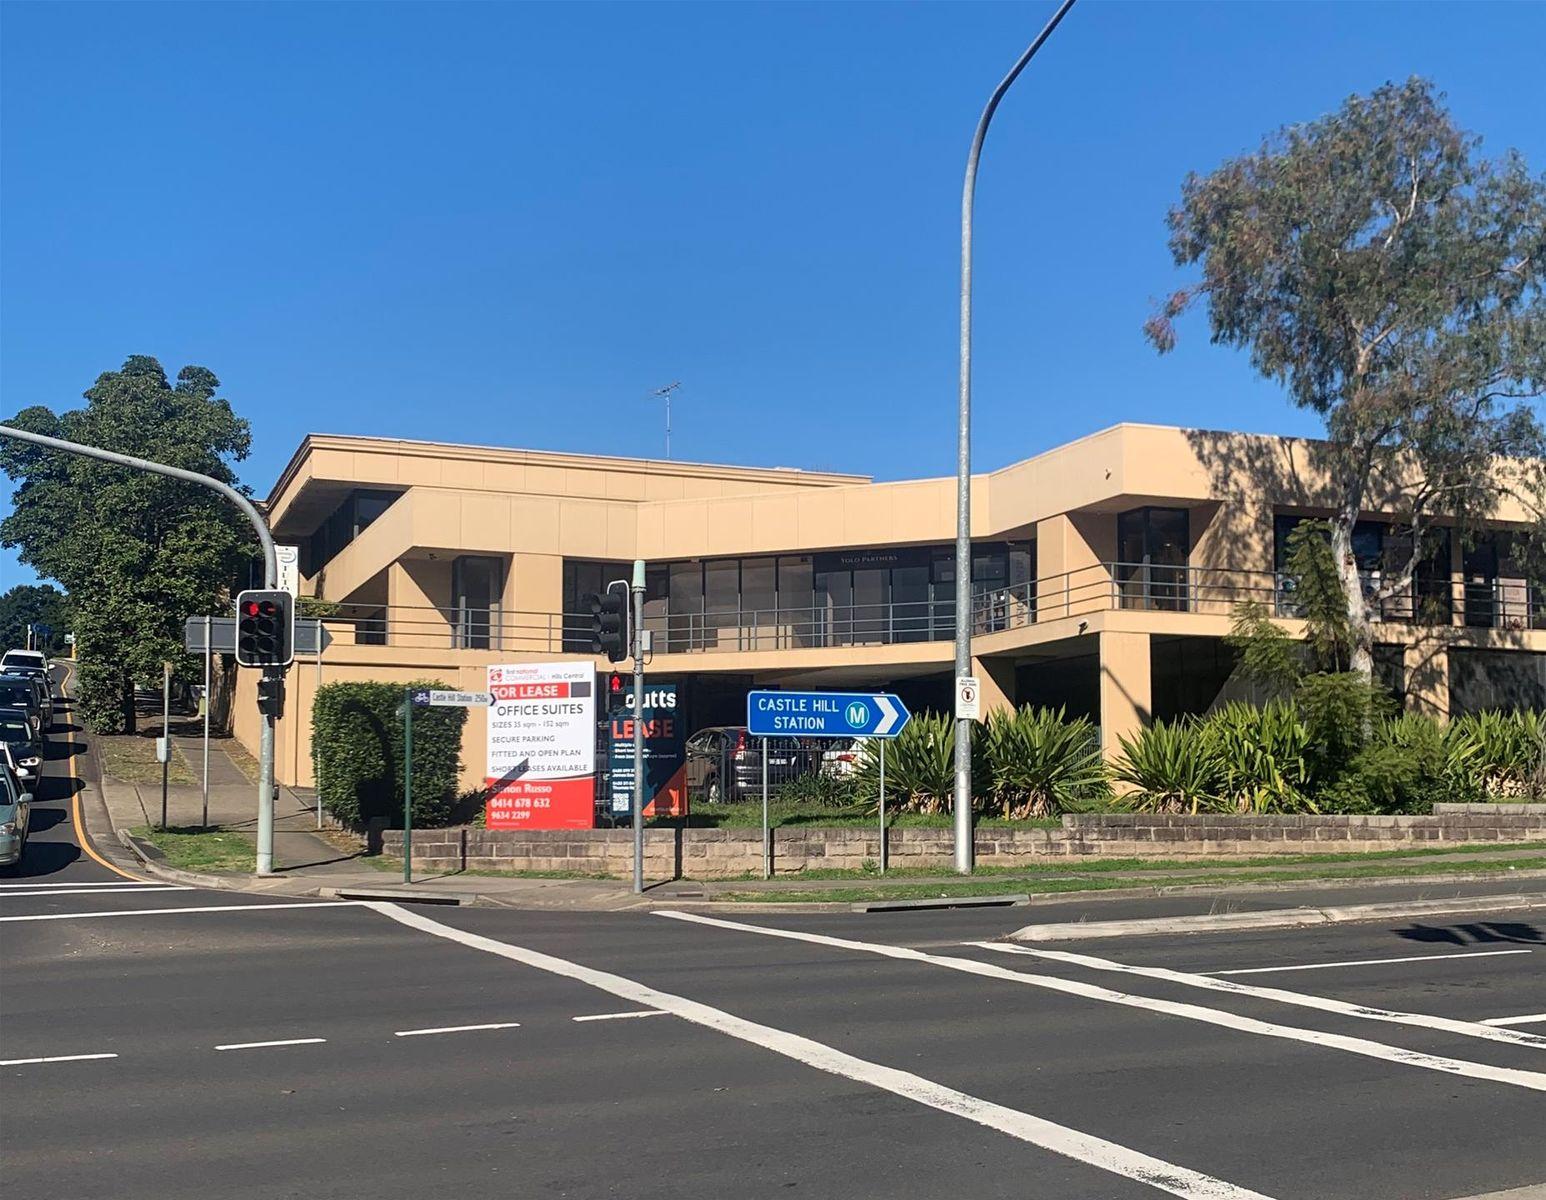 8/10-12 Old Castle Hill Road, Castle Hill, NSW 2154